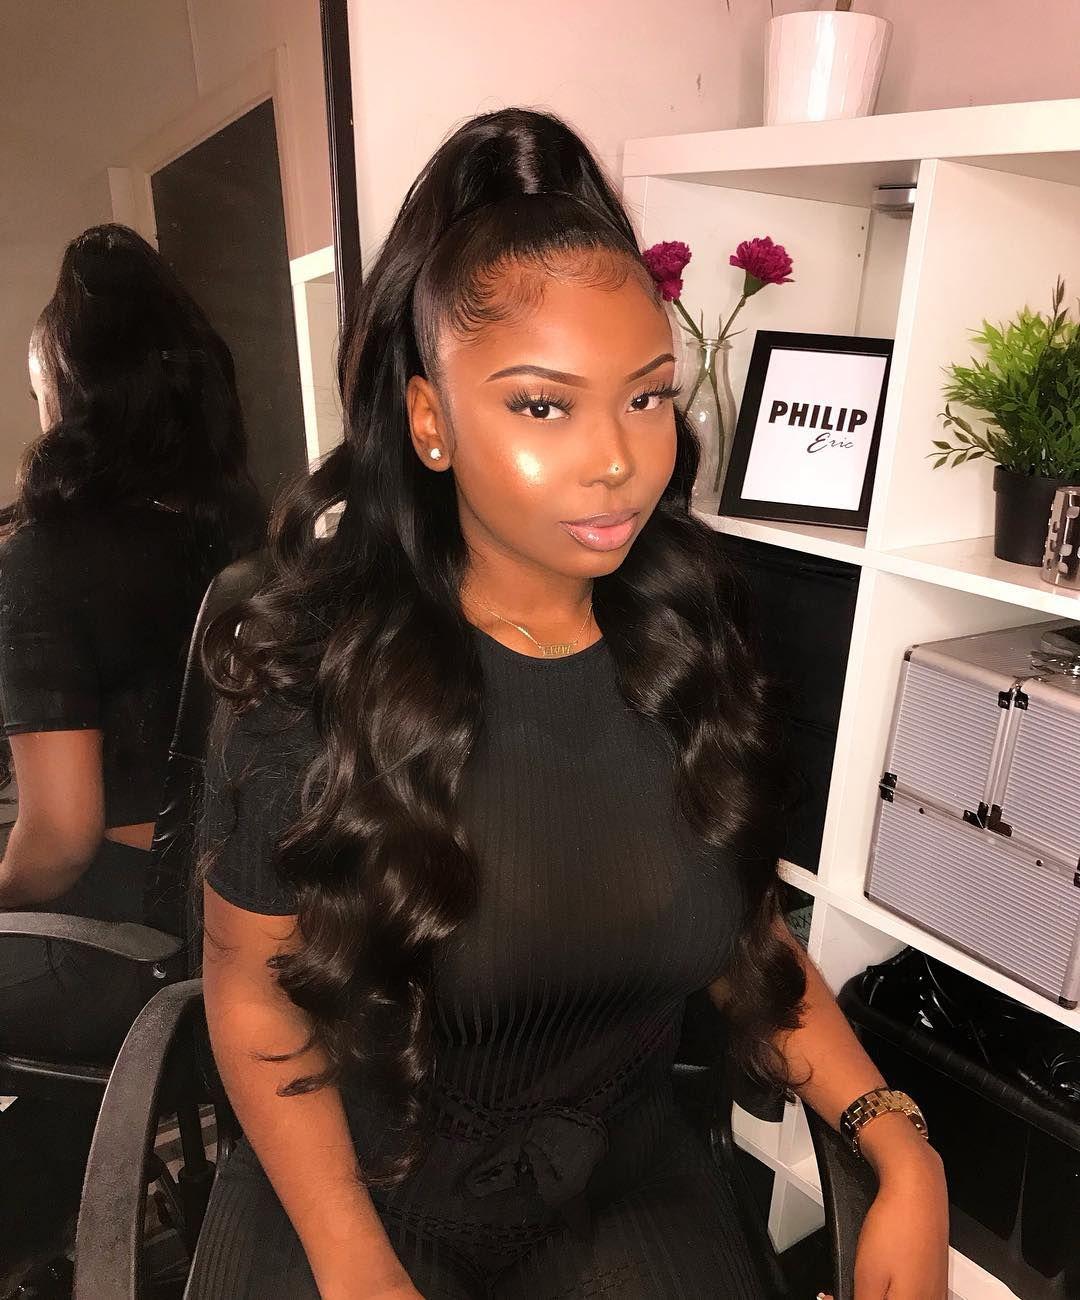 Sweetest 1 Half Up Half Down Slay By Philiperichair With My New Bodywave Hair Short Hair Styles For Round Faces Hairstyles For Round Faces Long Hair Styles